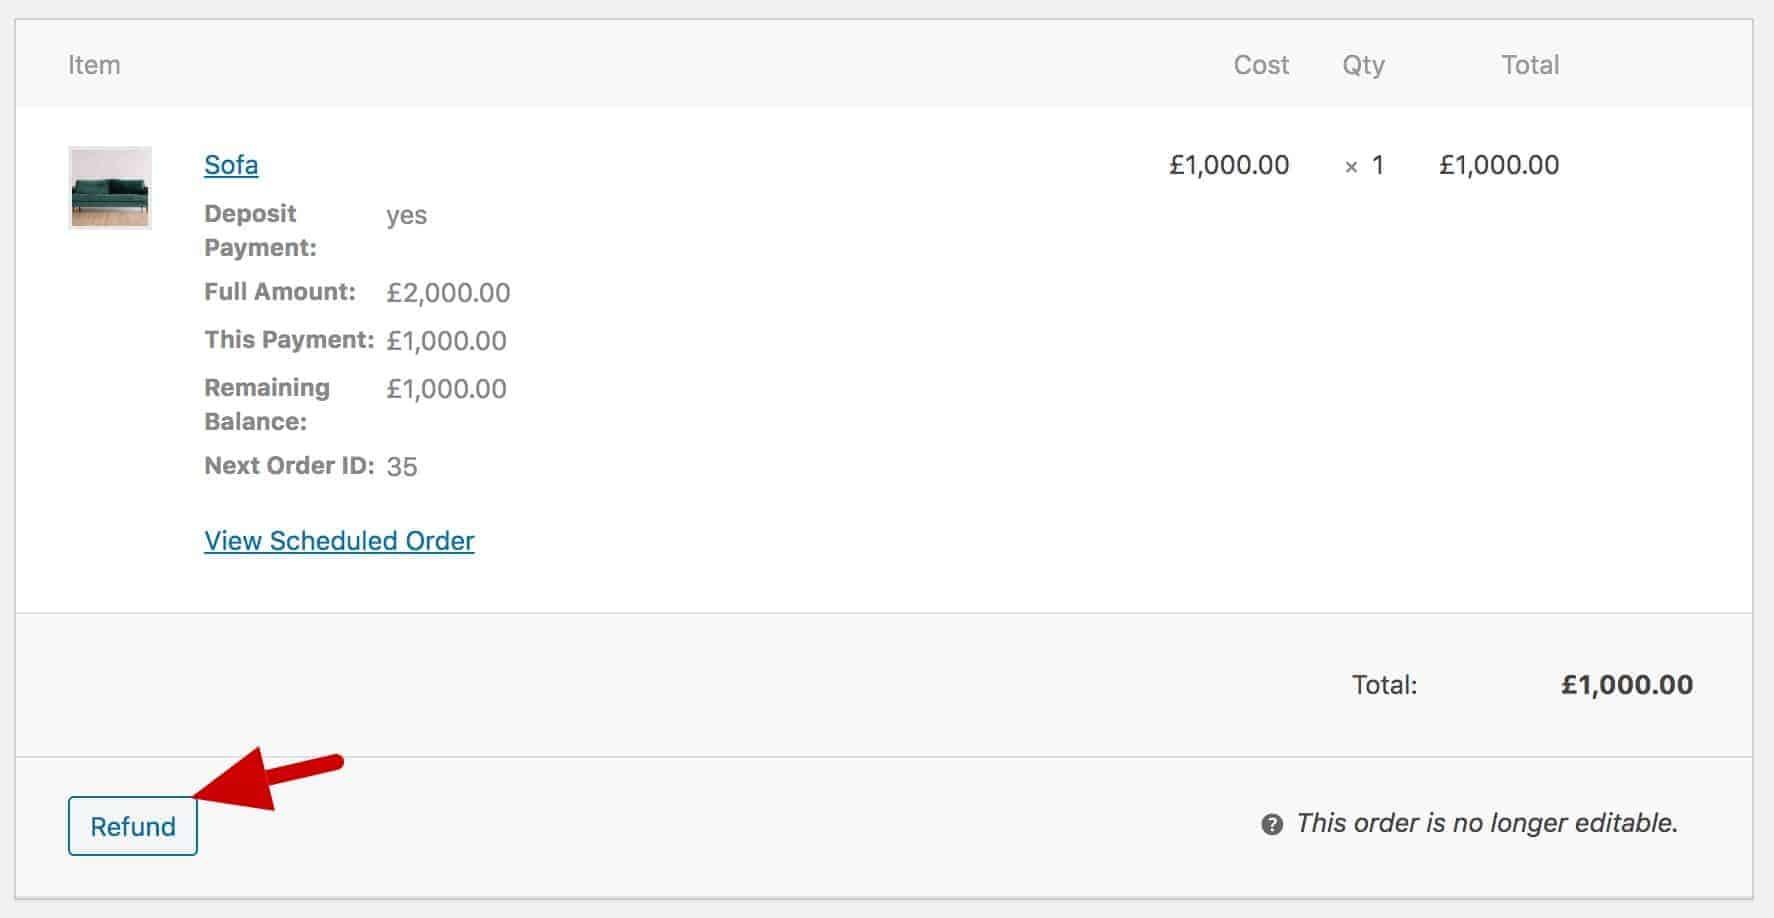 Refunding a deposit